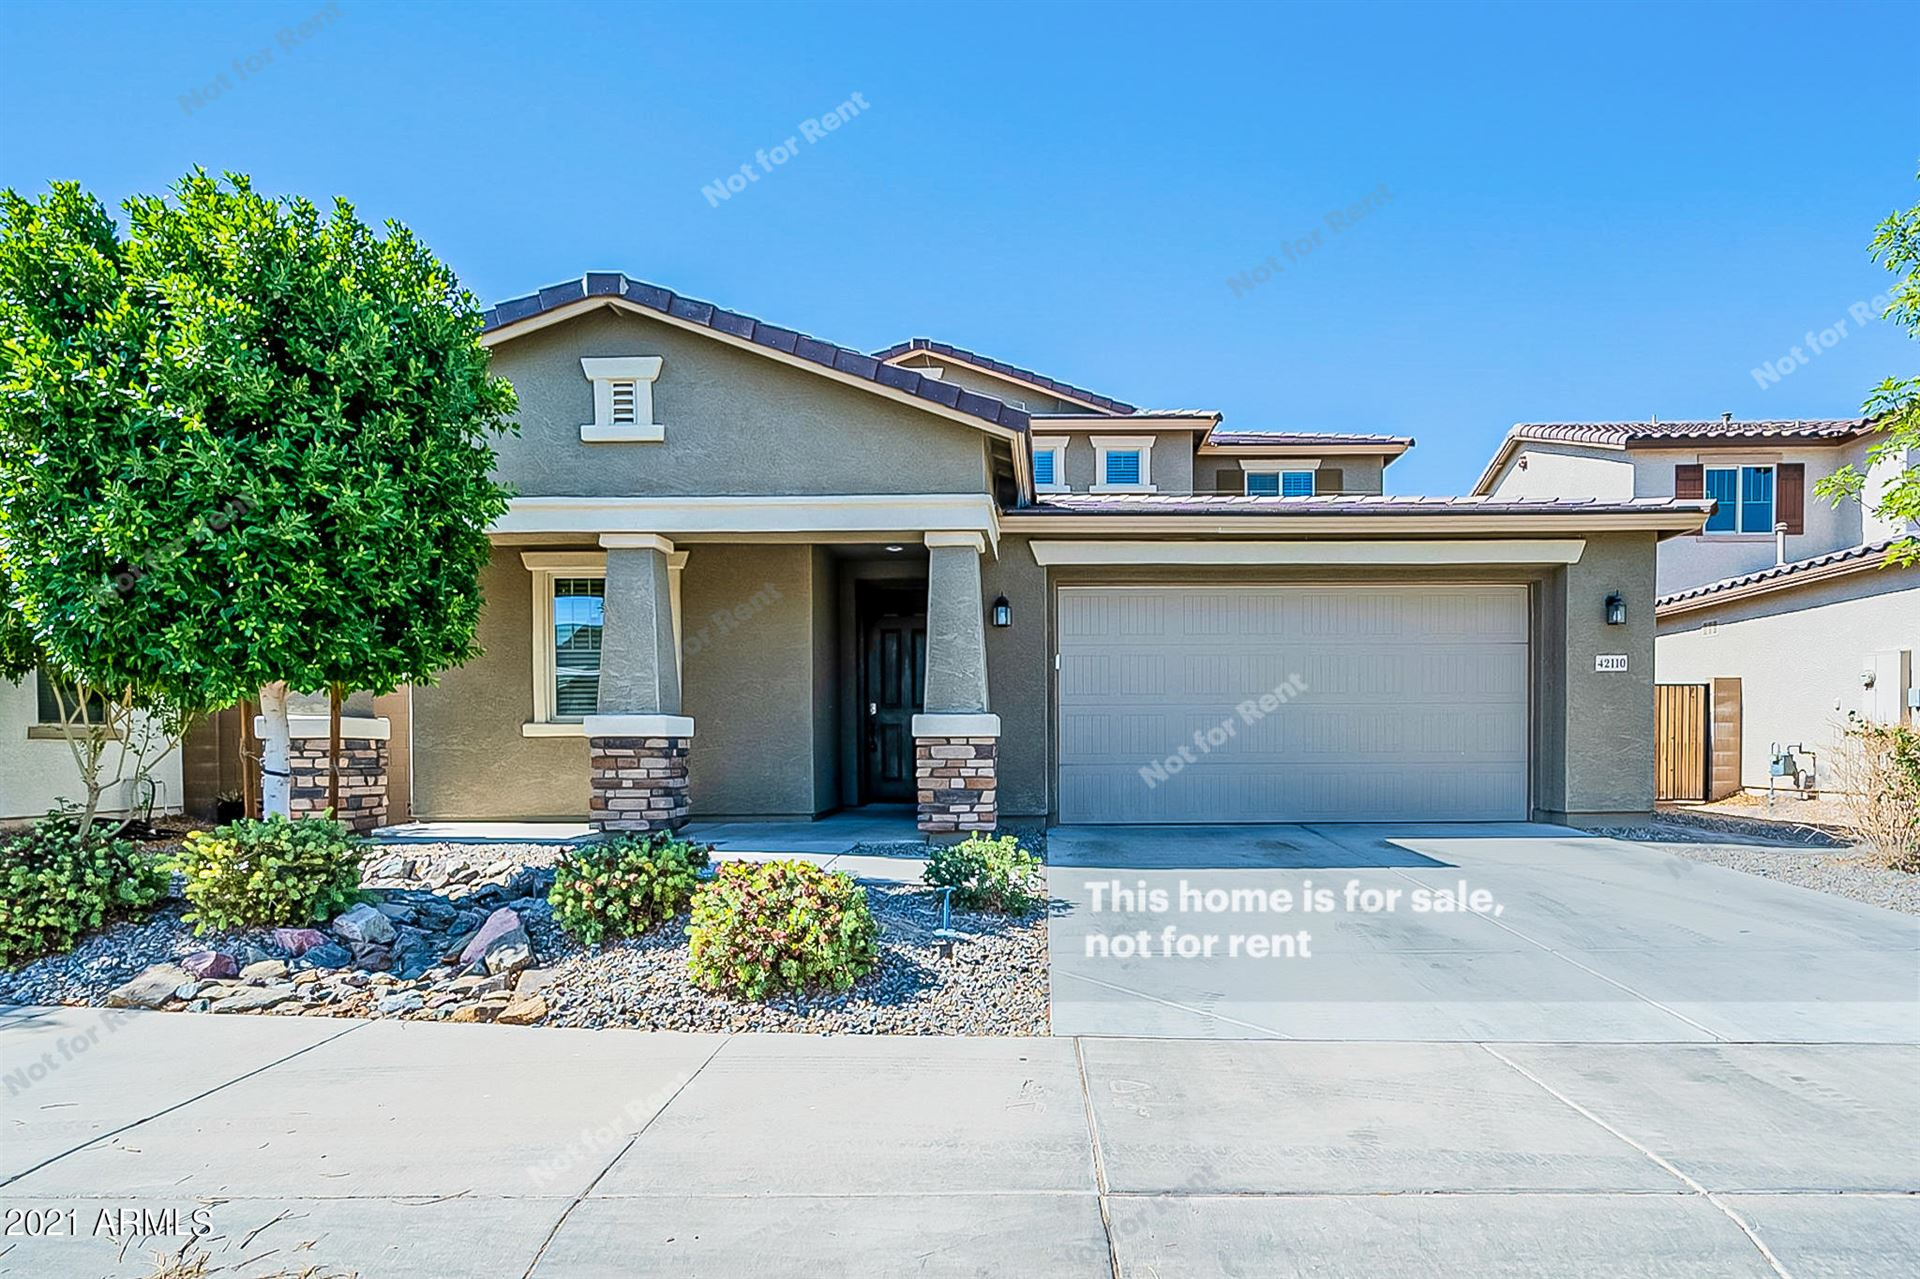 Photo for 42110 W SOMERSET Drive, Maricopa, AZ 85138 (MLS # 6236024)